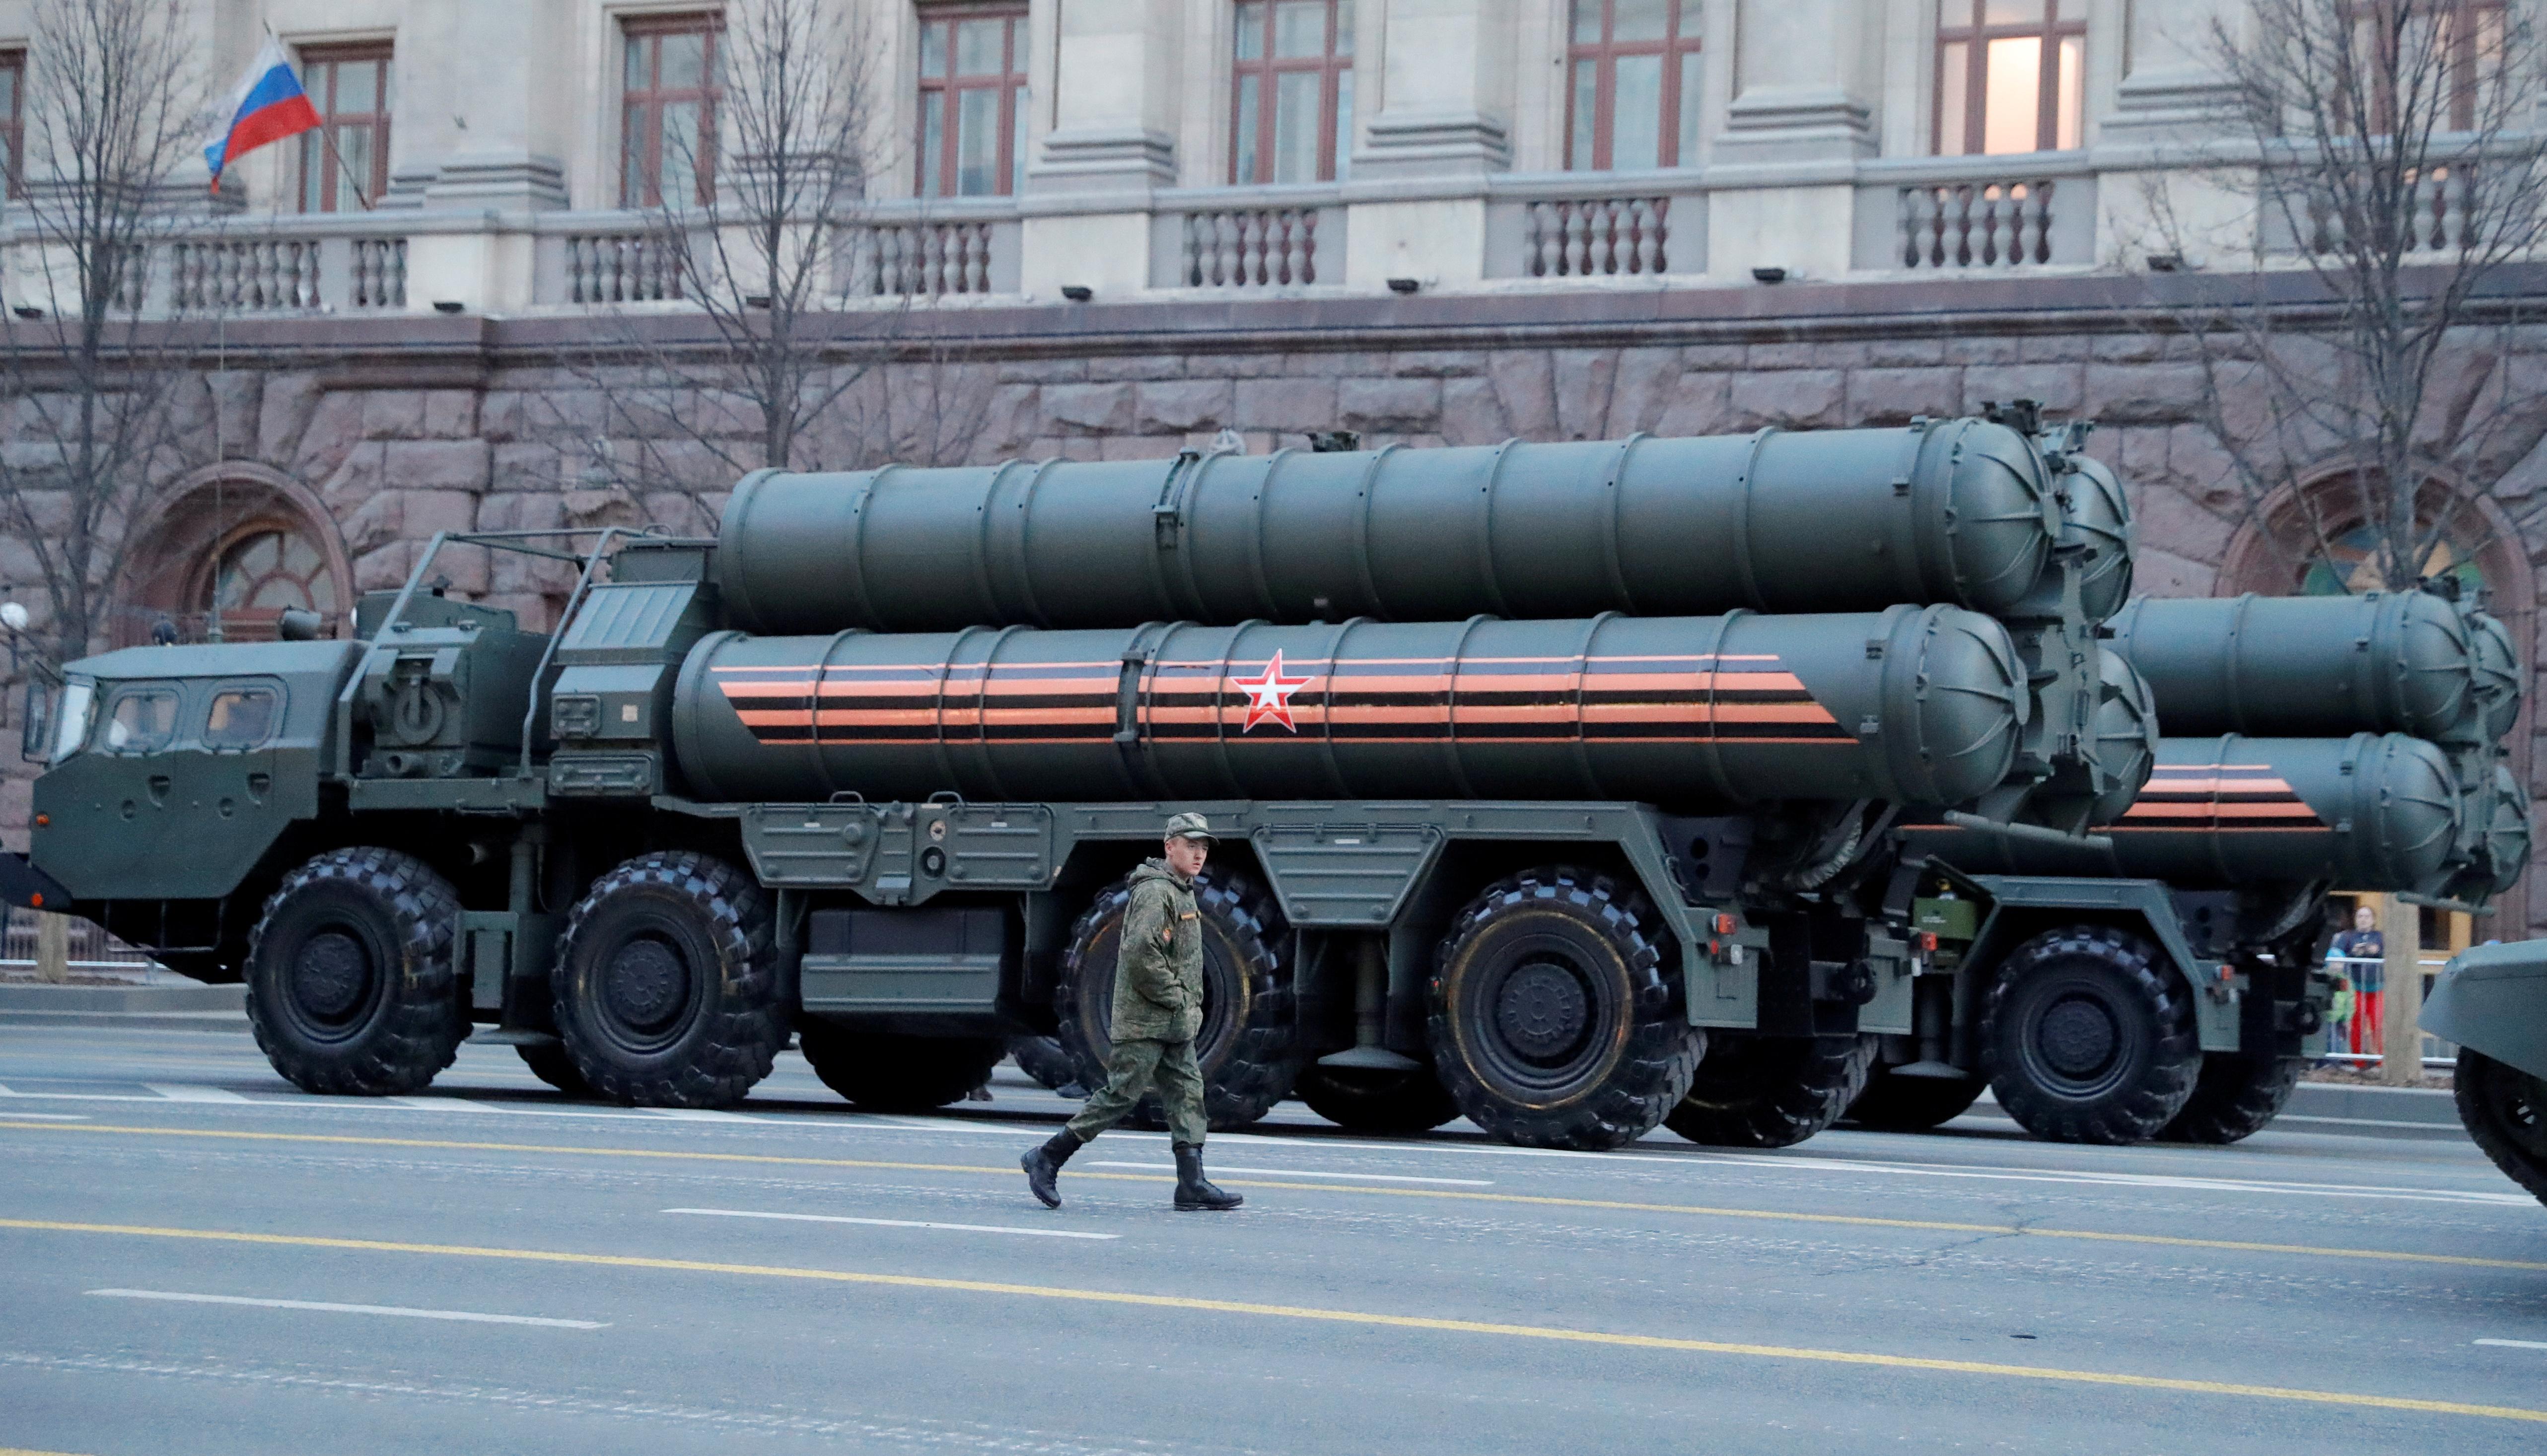 Turkey should scrap Russian missile system or face U.S. sanctions:...